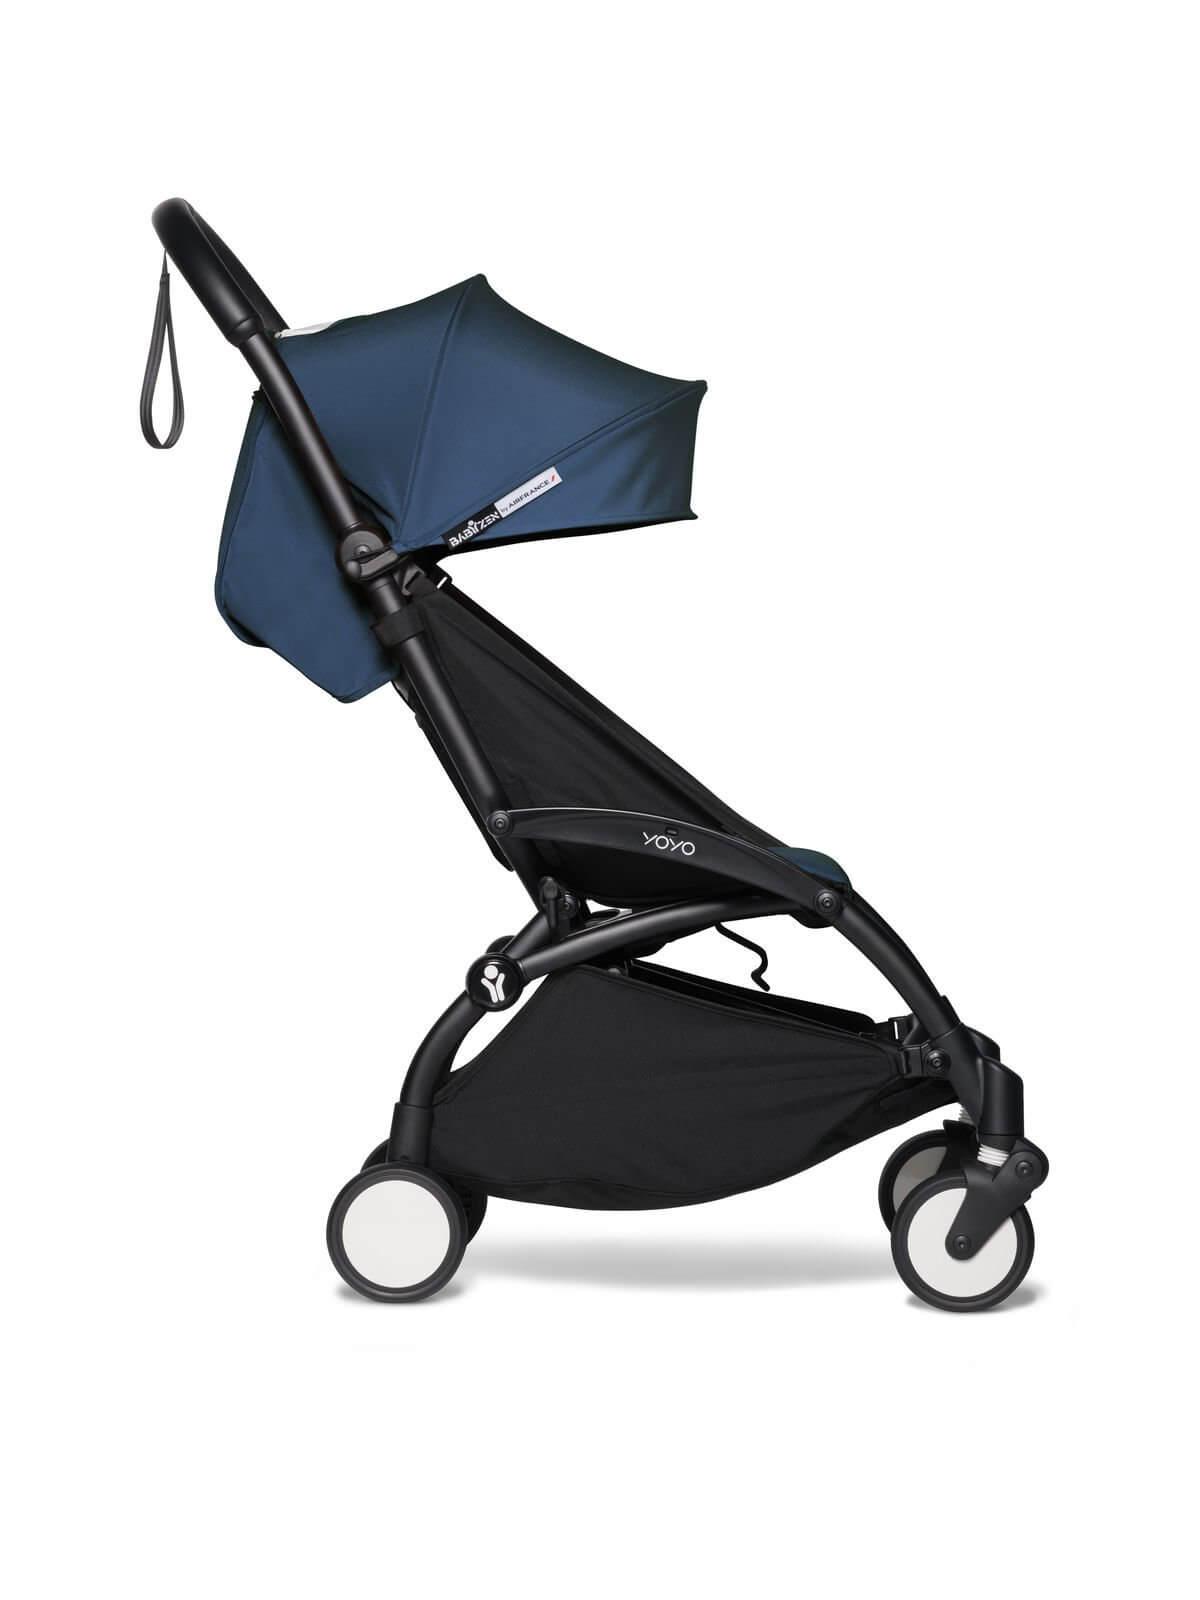 Babyzen-YOYO2-6-Frame-Black-Color-Pack-Air-France-Blue